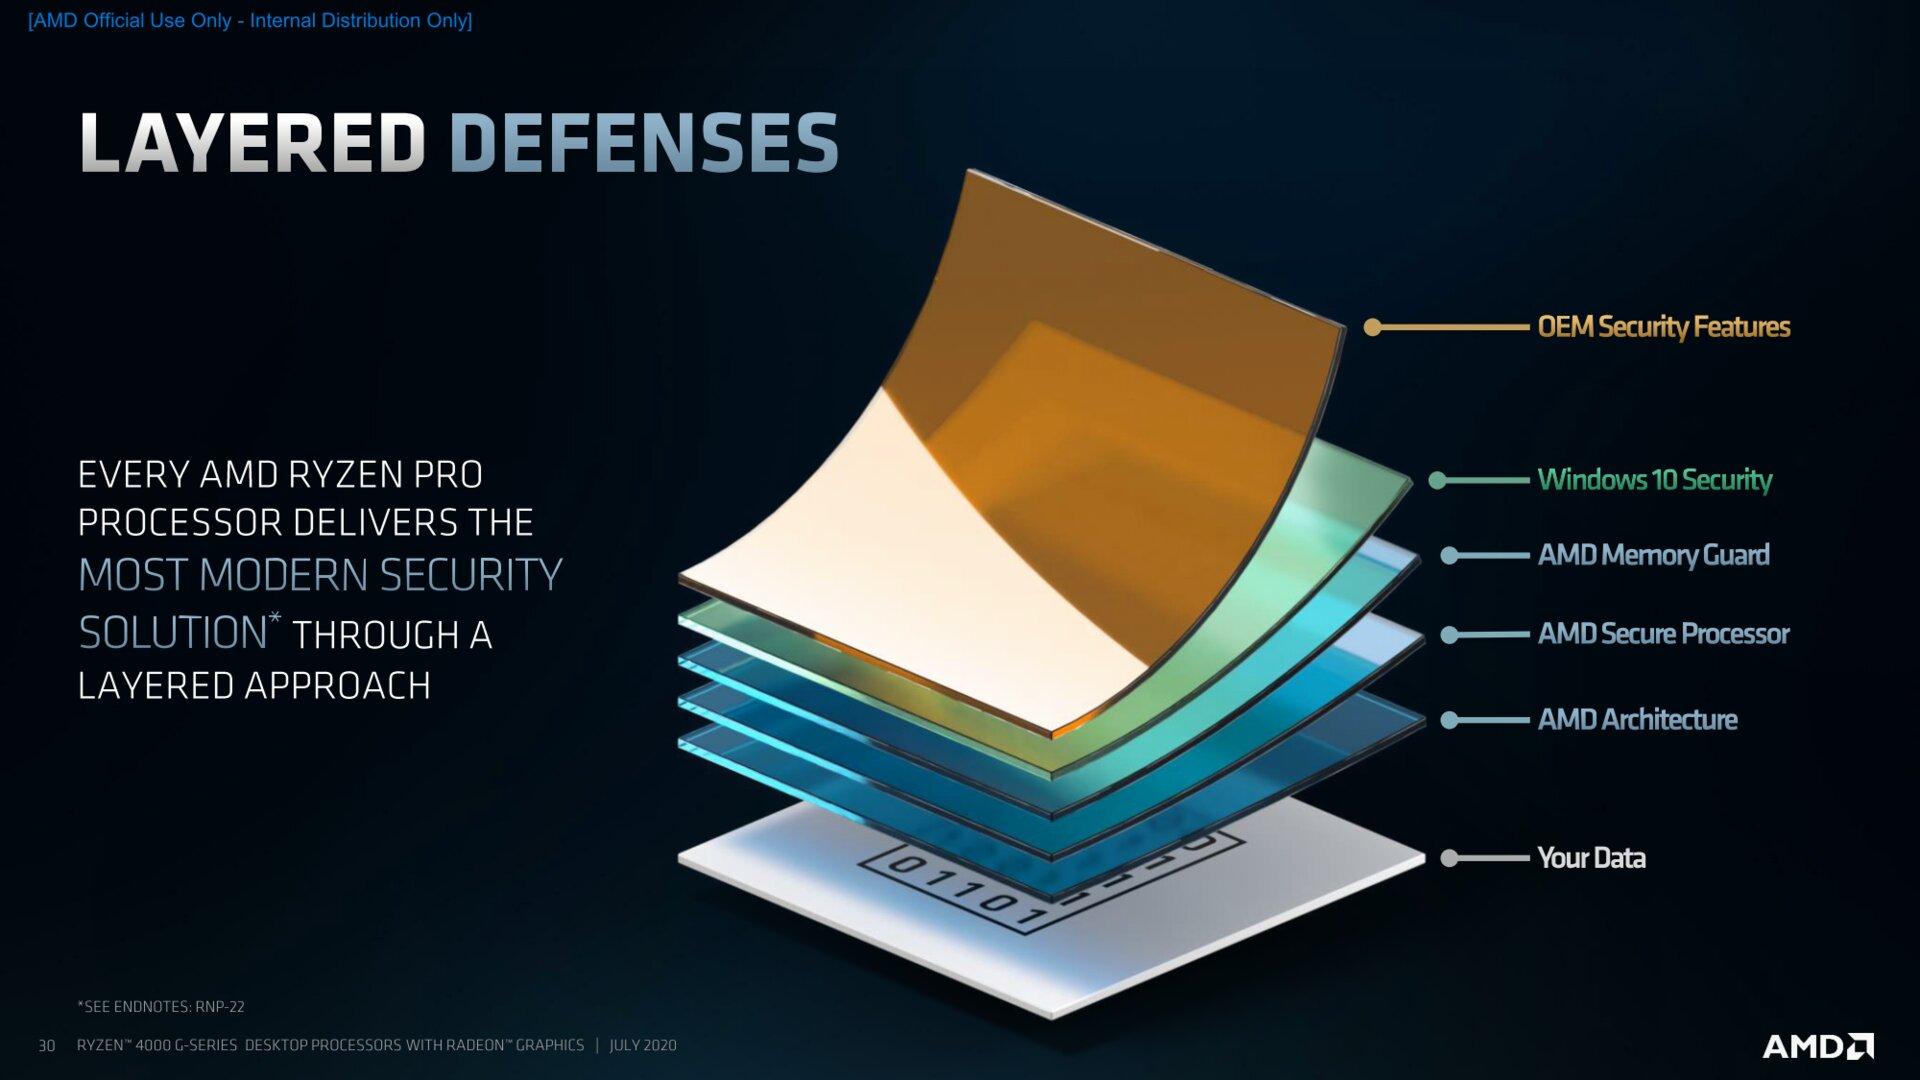 AMD Pro Technologies